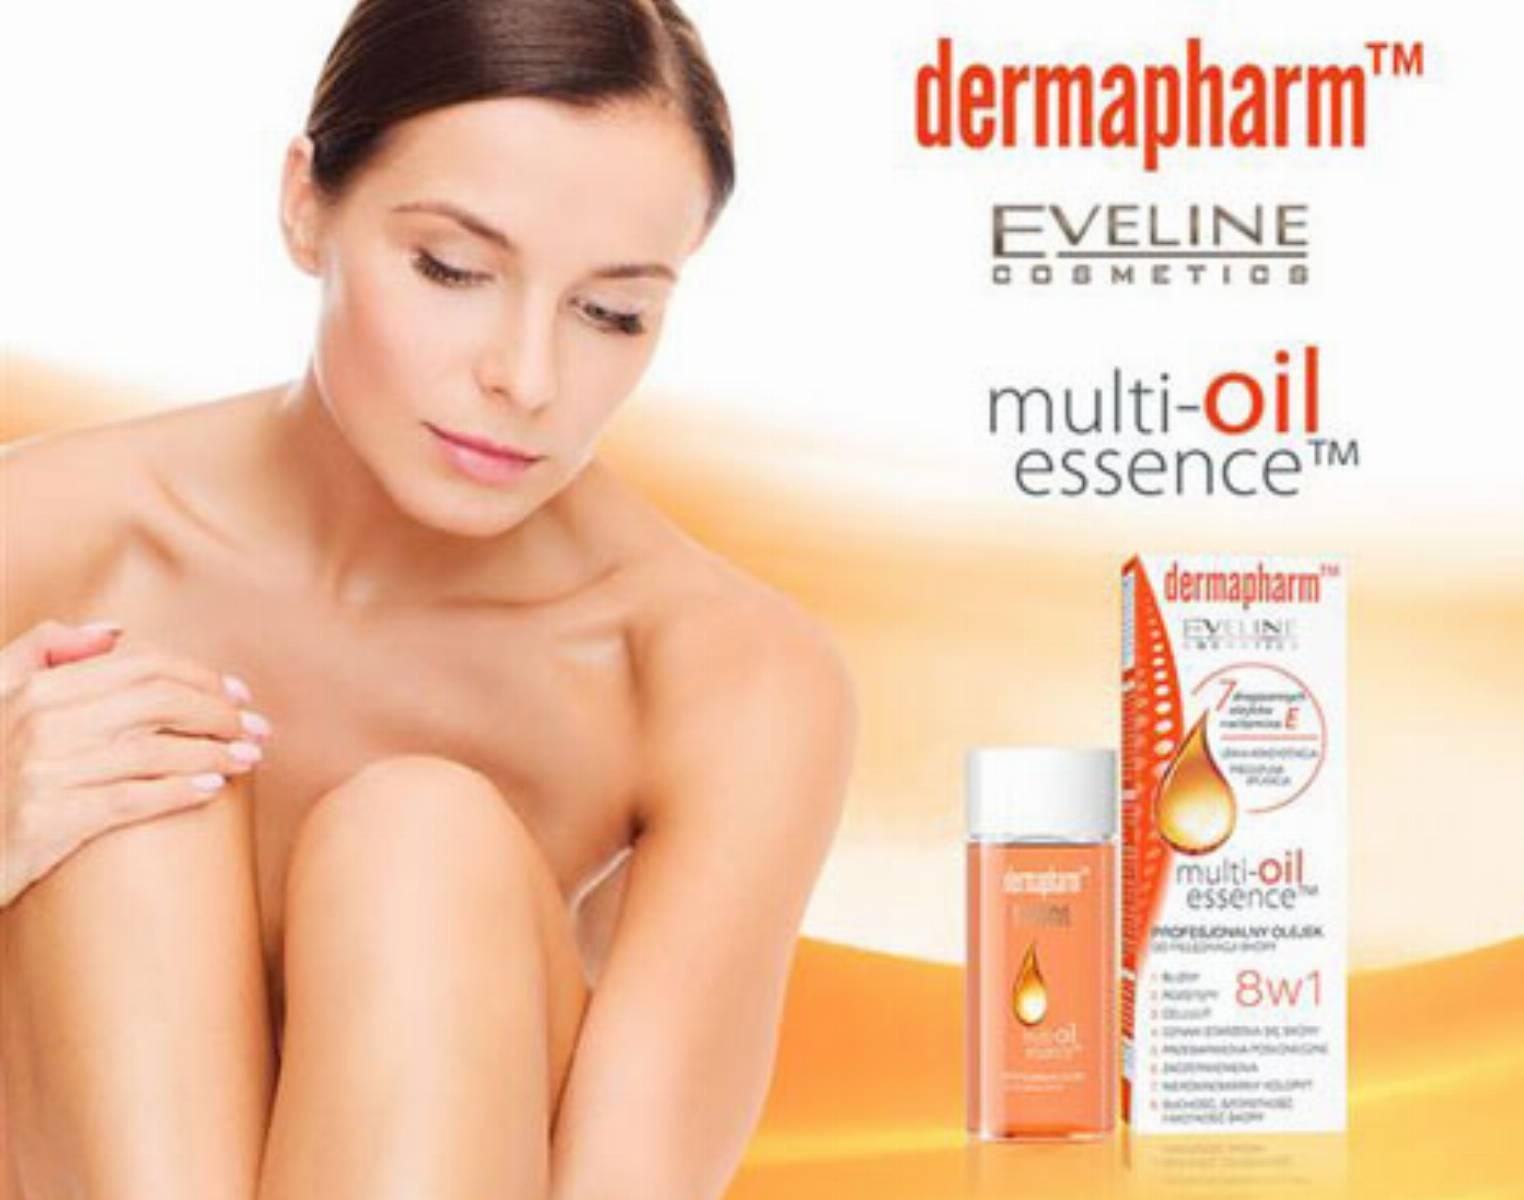 Dermapharm Multi-oil essence 8 w 1 Eveline